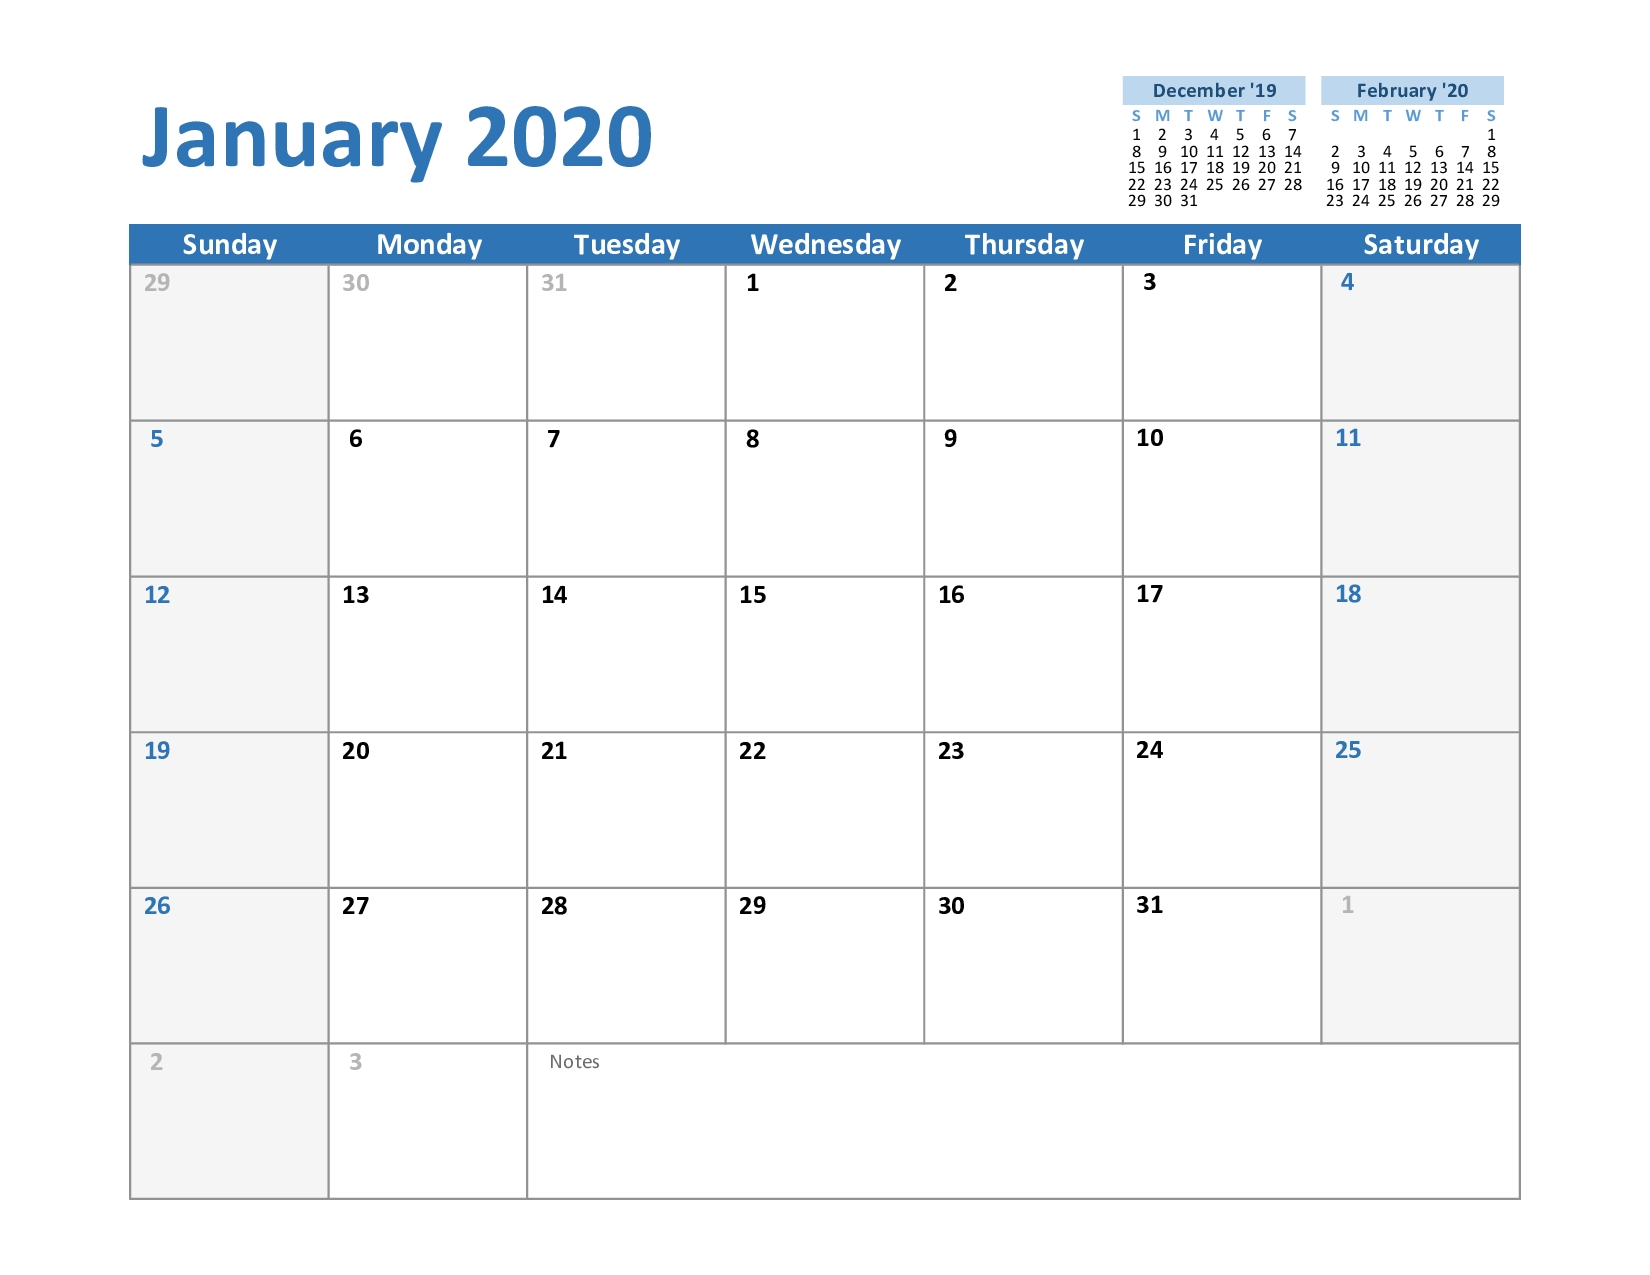 Free January Calendar 2020 Printable Template Blank In Pdf-Printable January 2020 Calendar Word